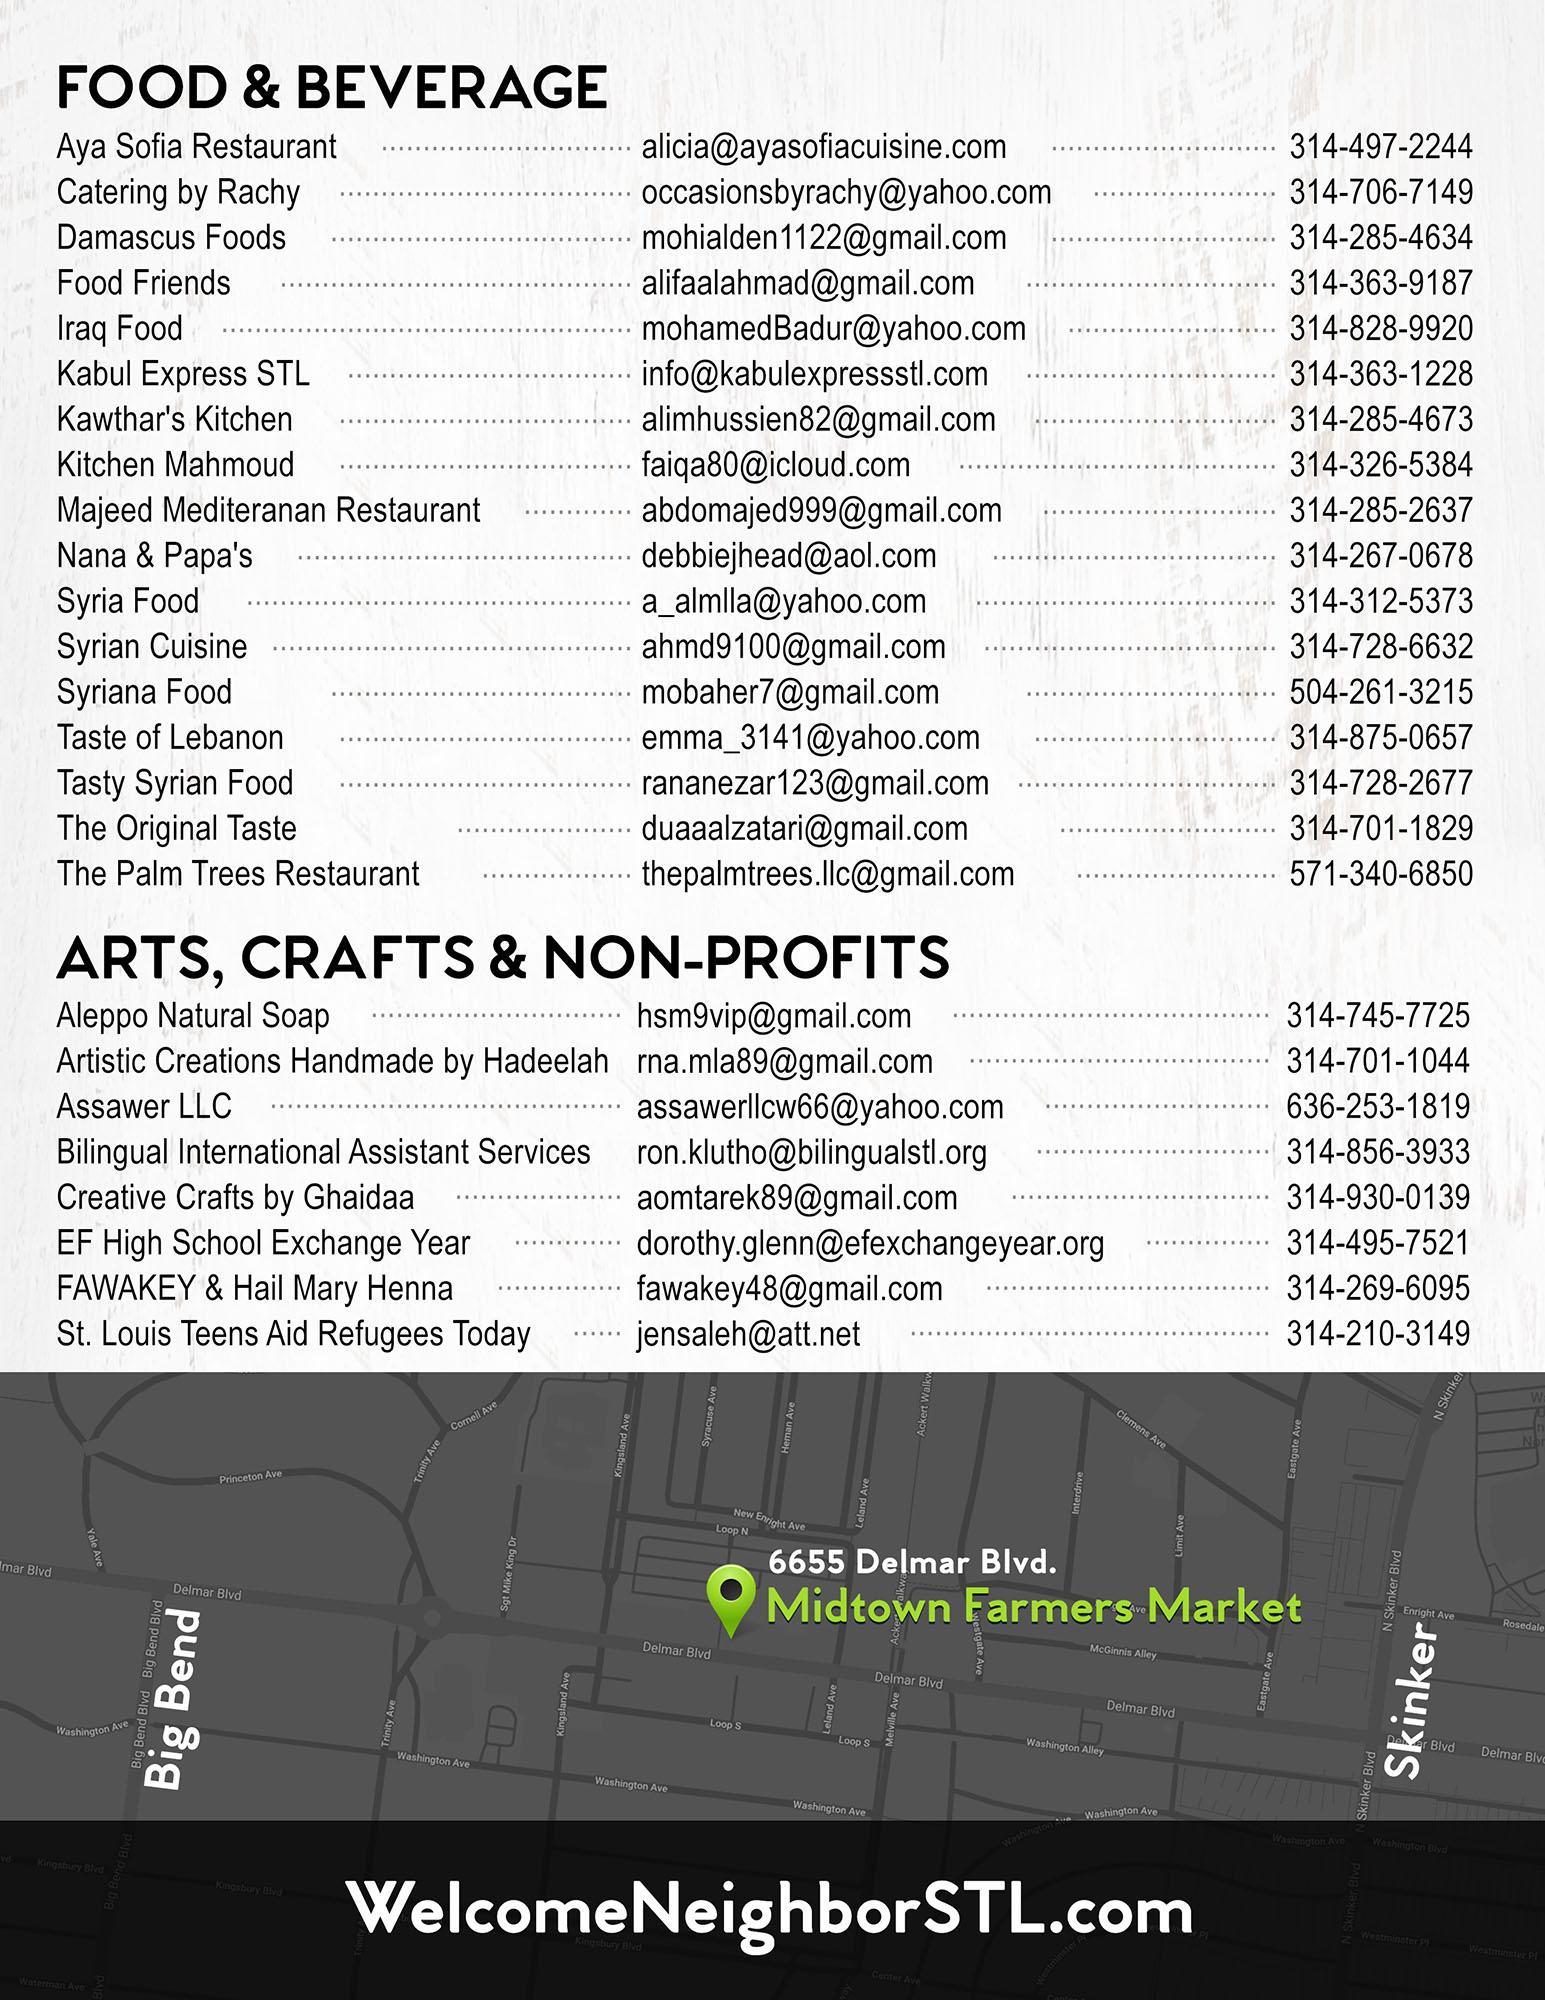 Festival Guide Vendor List